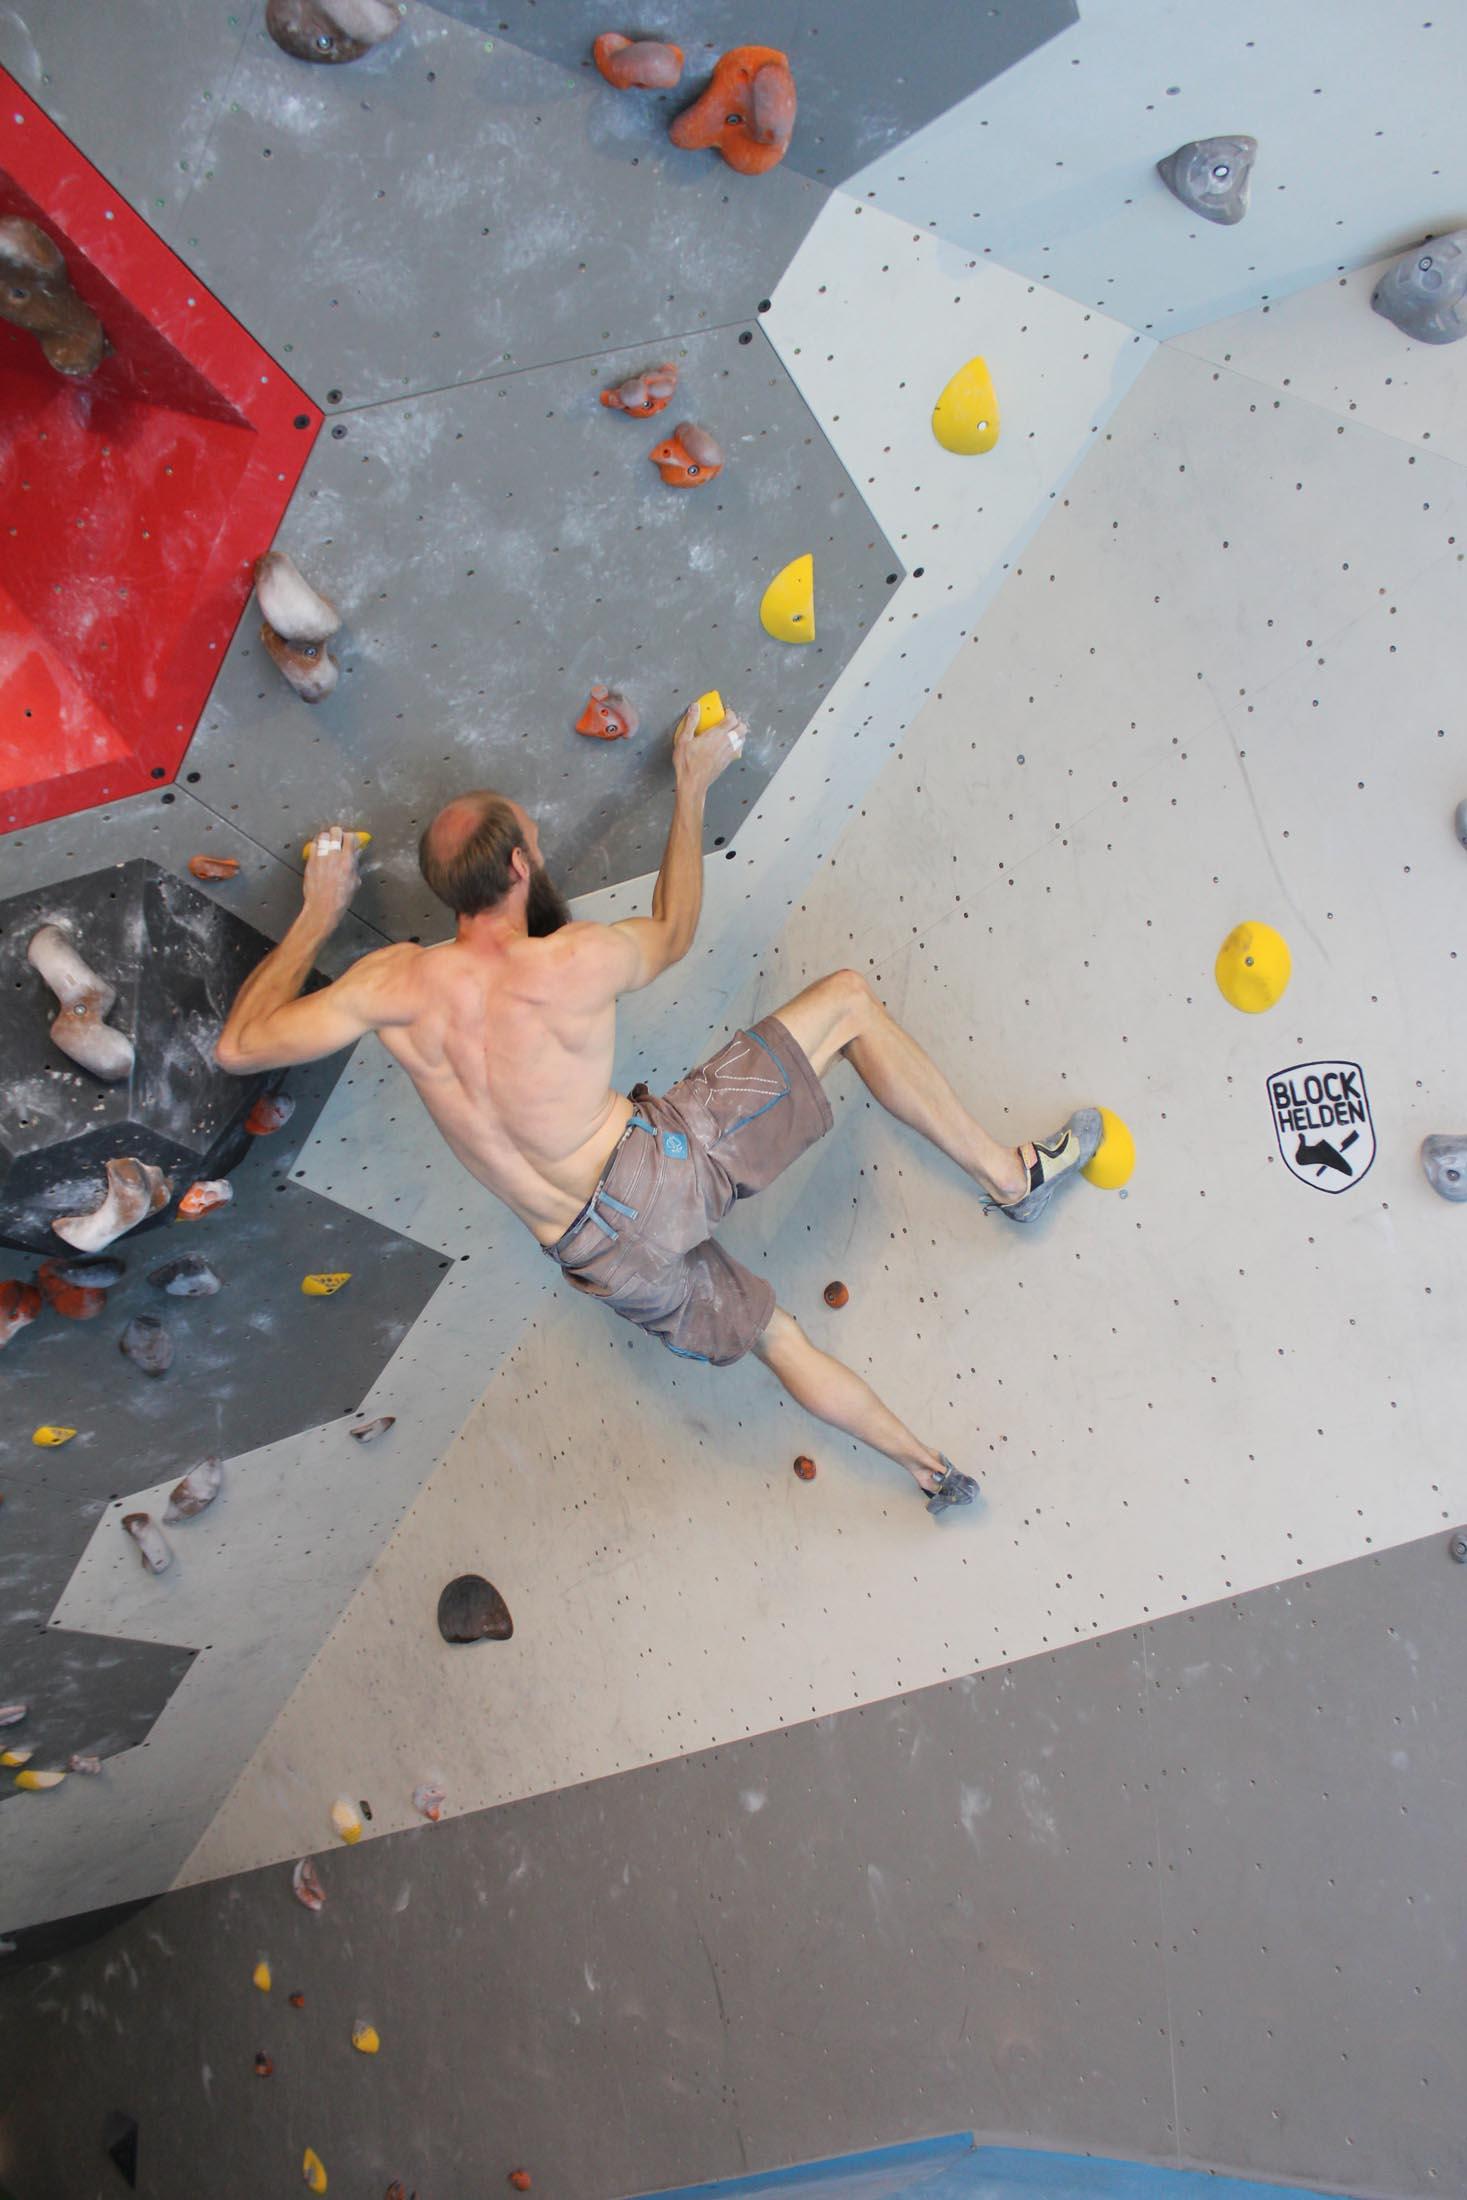 Quali, internationaler bouldercup Frankenjura 2016, BLOCKHELDEN Erlangen, Mammut, Bergfreunde.de, Boulderwettkampf07092016325